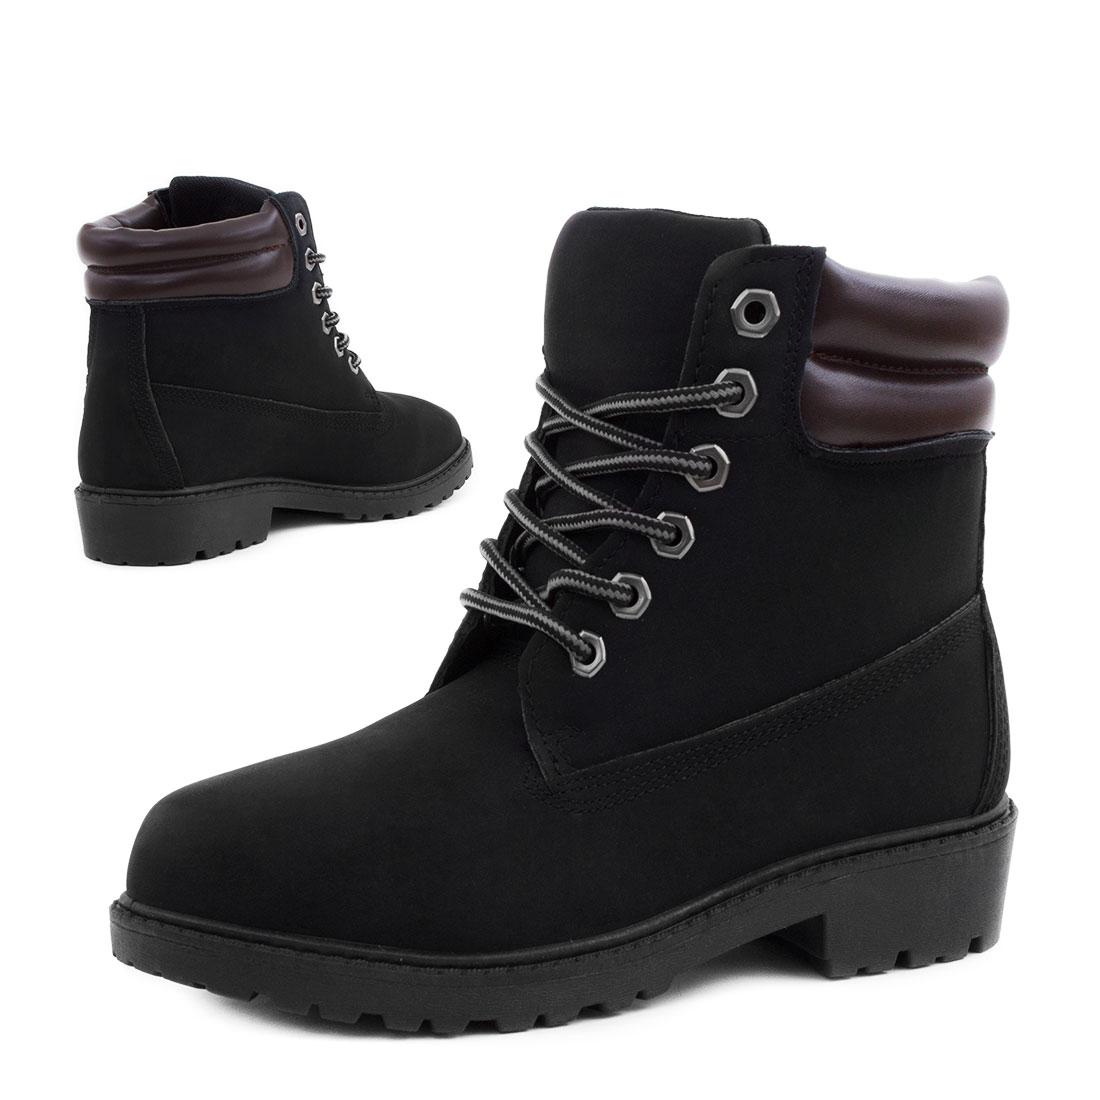 damen herbst winter boots schn rer metallic stiefeletten gr e 36 37 38 39 40 41 ebay. Black Bedroom Furniture Sets. Home Design Ideas